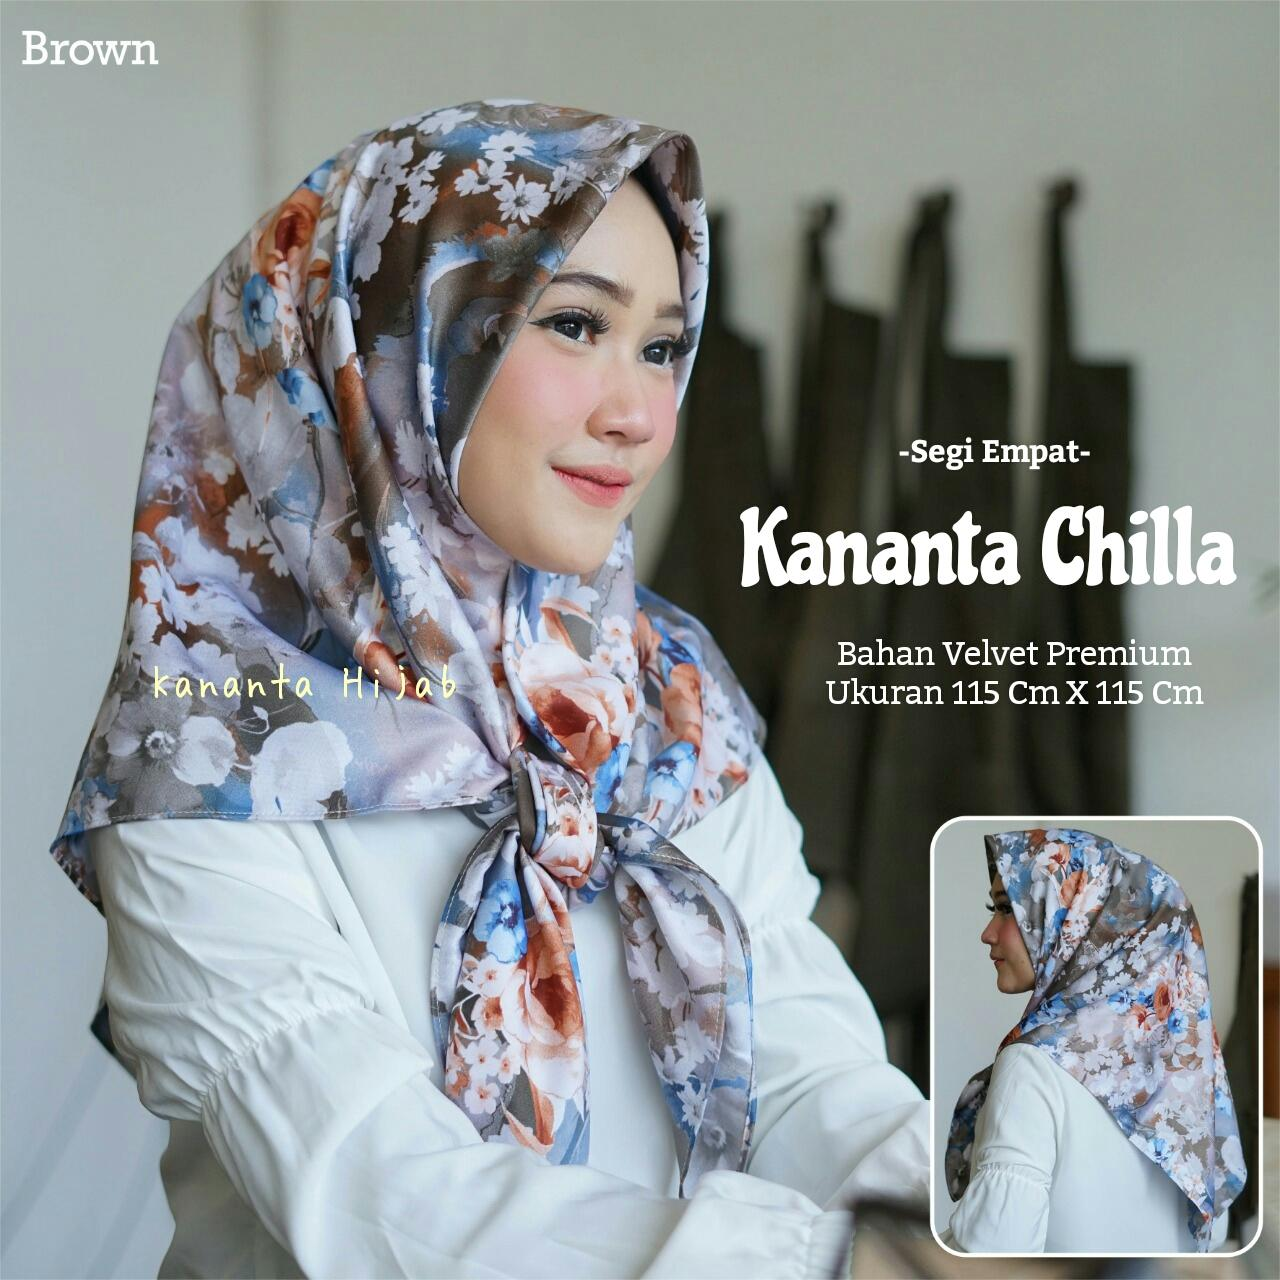 Kananta Hijab Segi Empat Motif Bunga Bahan Velvet Premium Kananta CHILLA